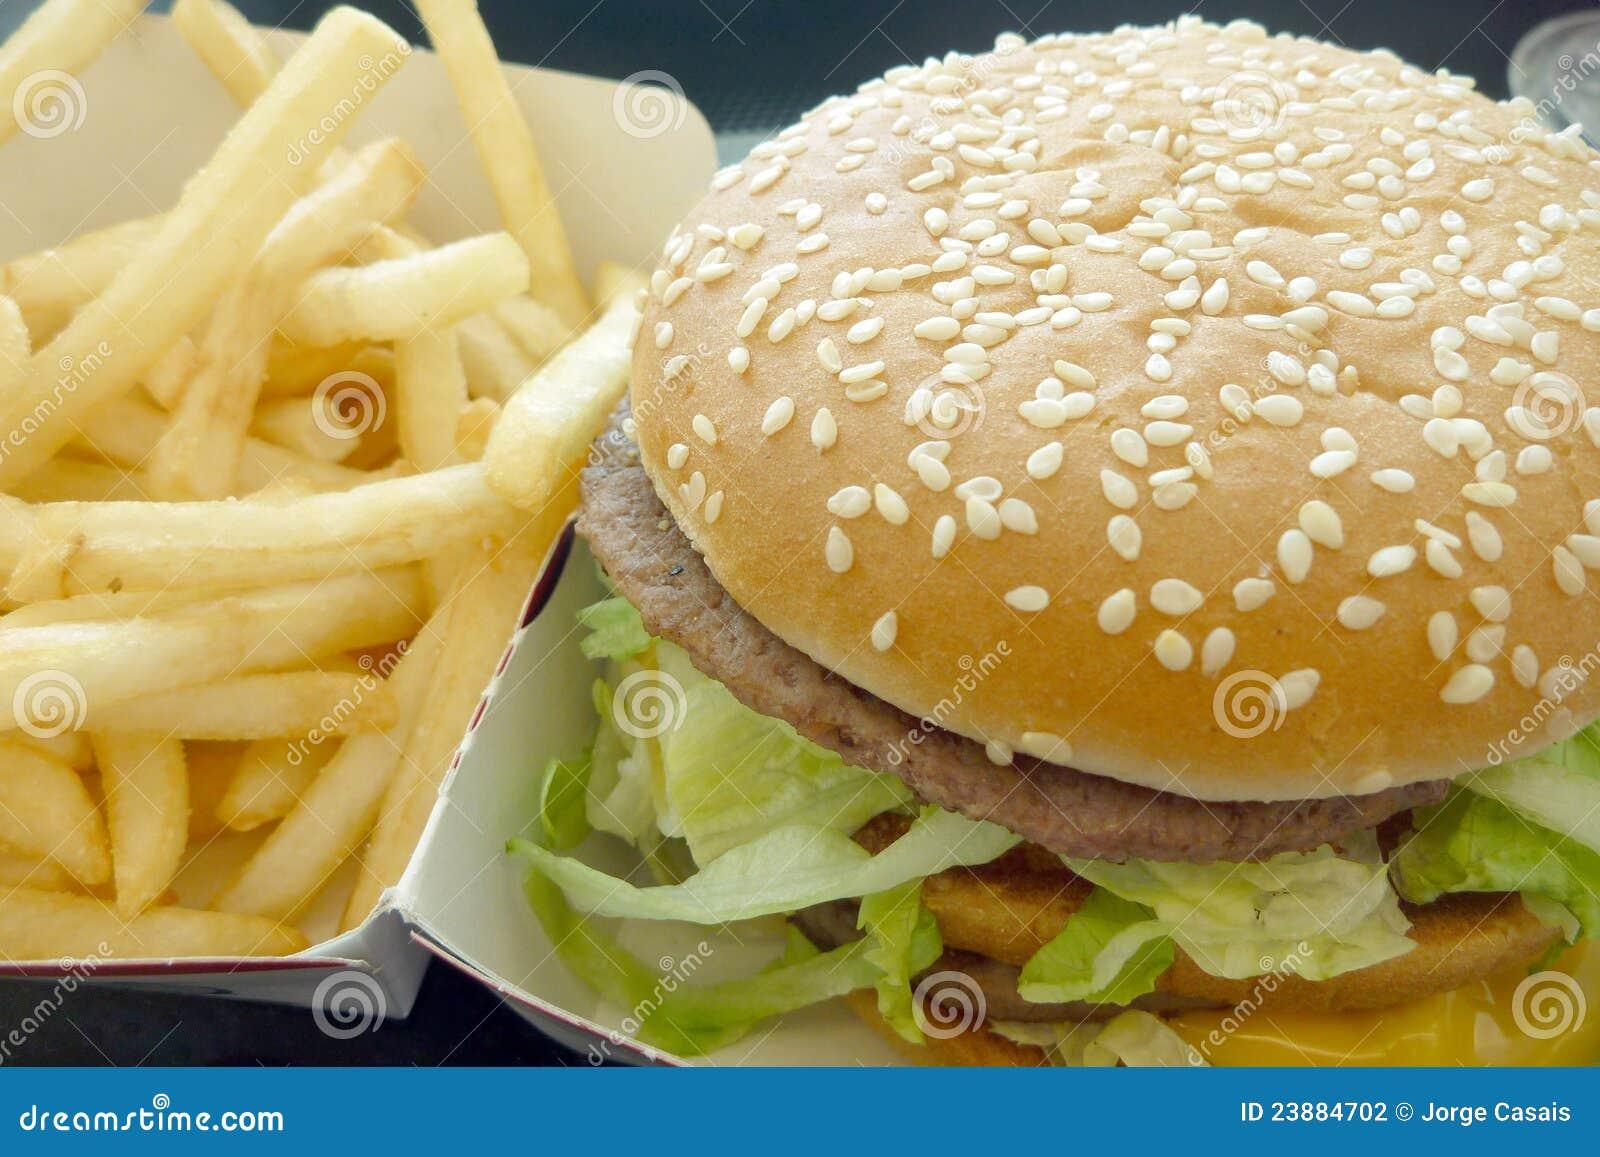 Tasty hamburger with fries, unhealthy food, health concept